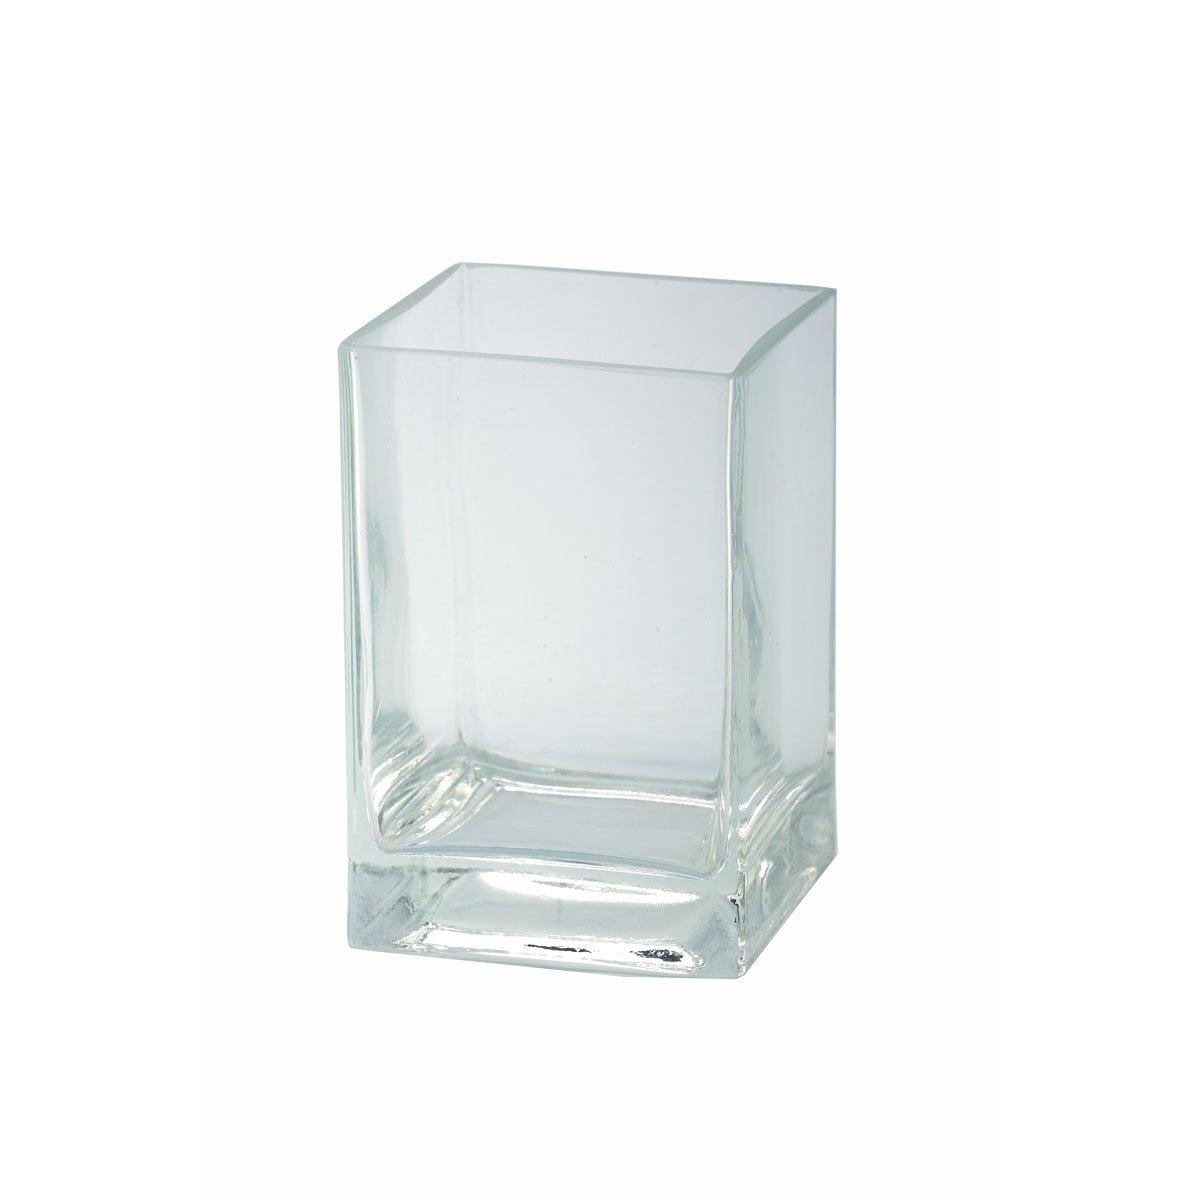 Florero de cuadro en vidrio transparente chico sears com - Vidrio plastico para cuadros ...